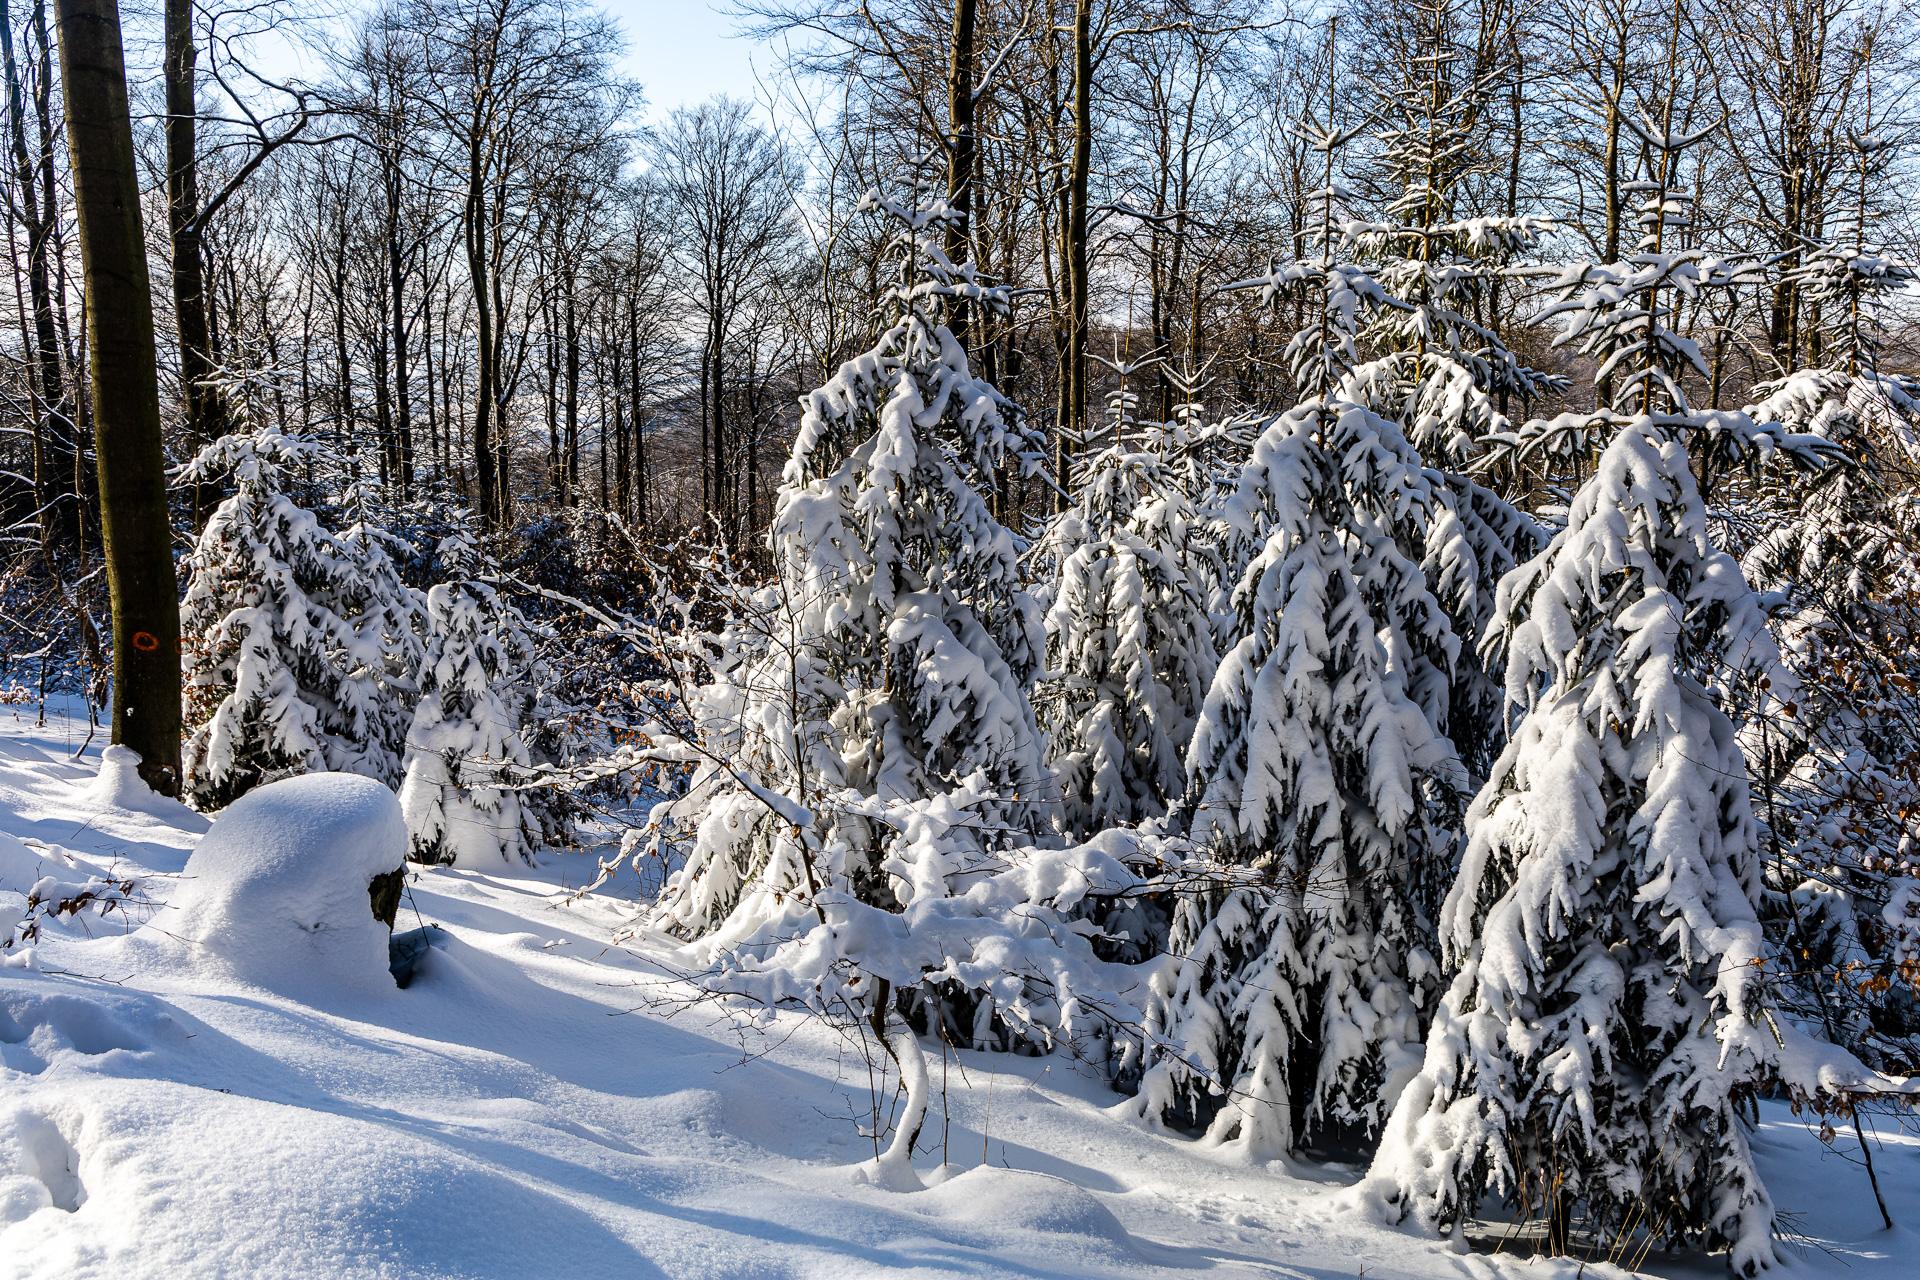 Schneewanderung zum Süntelturm